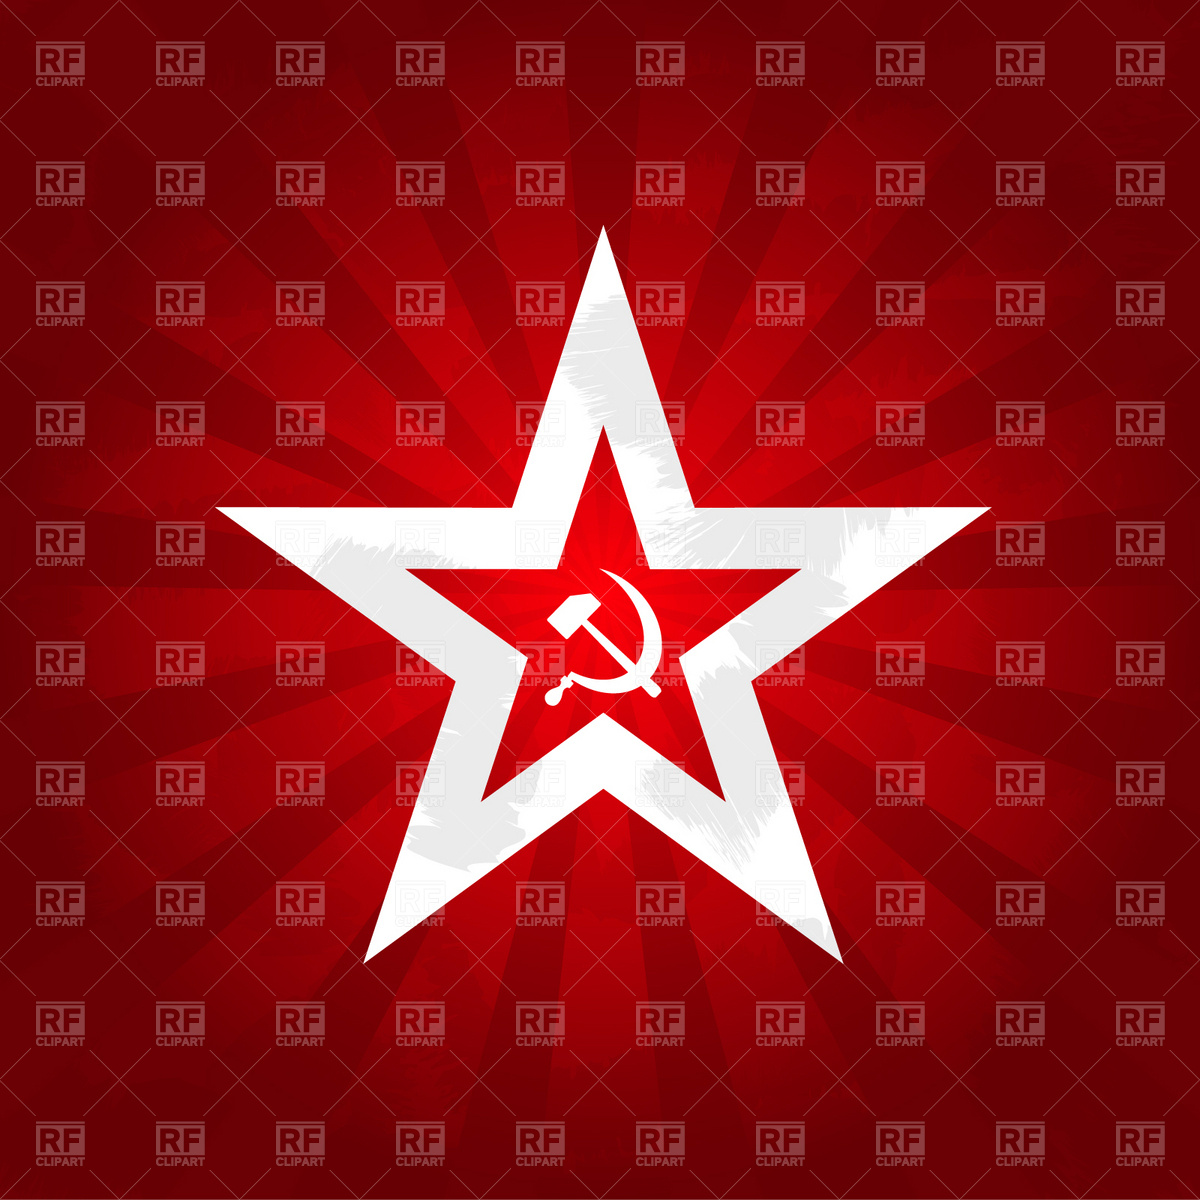 1200x1200 Communism Symbols Sickle And Hammer Vector Image Vector Artwork